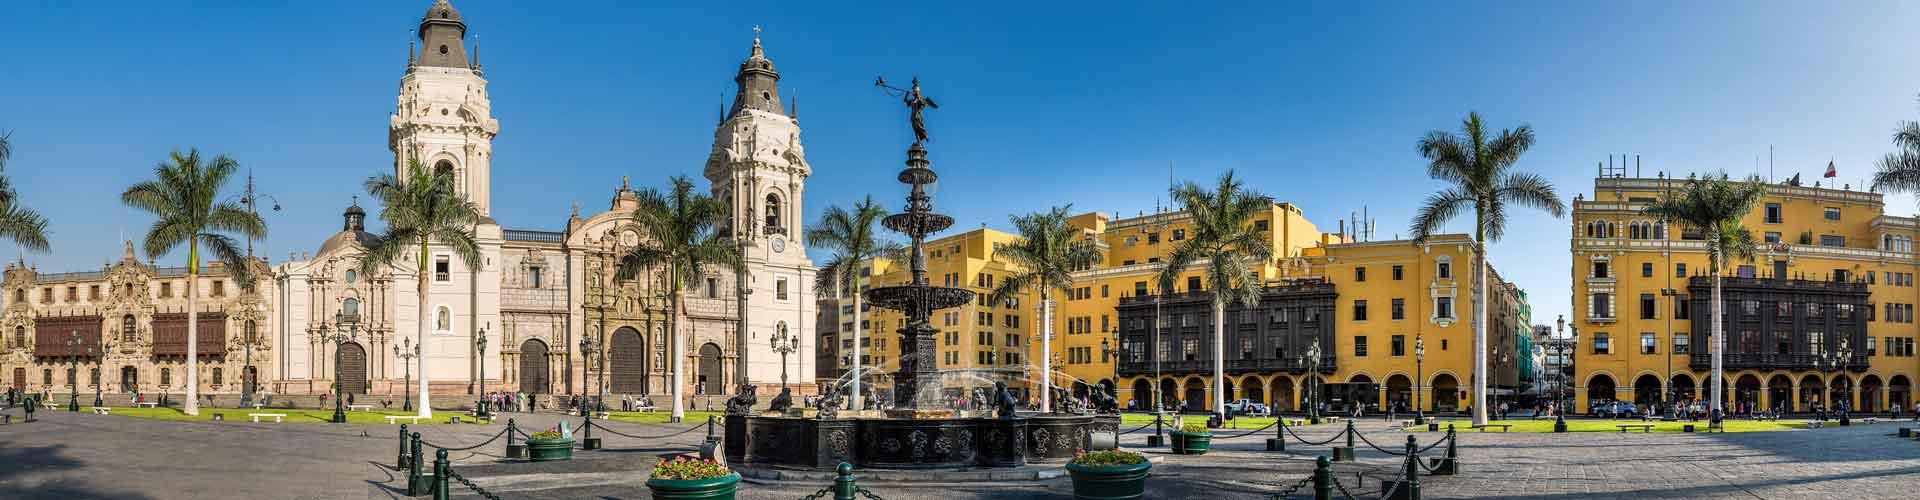 Best of South America I Intrepid Travel